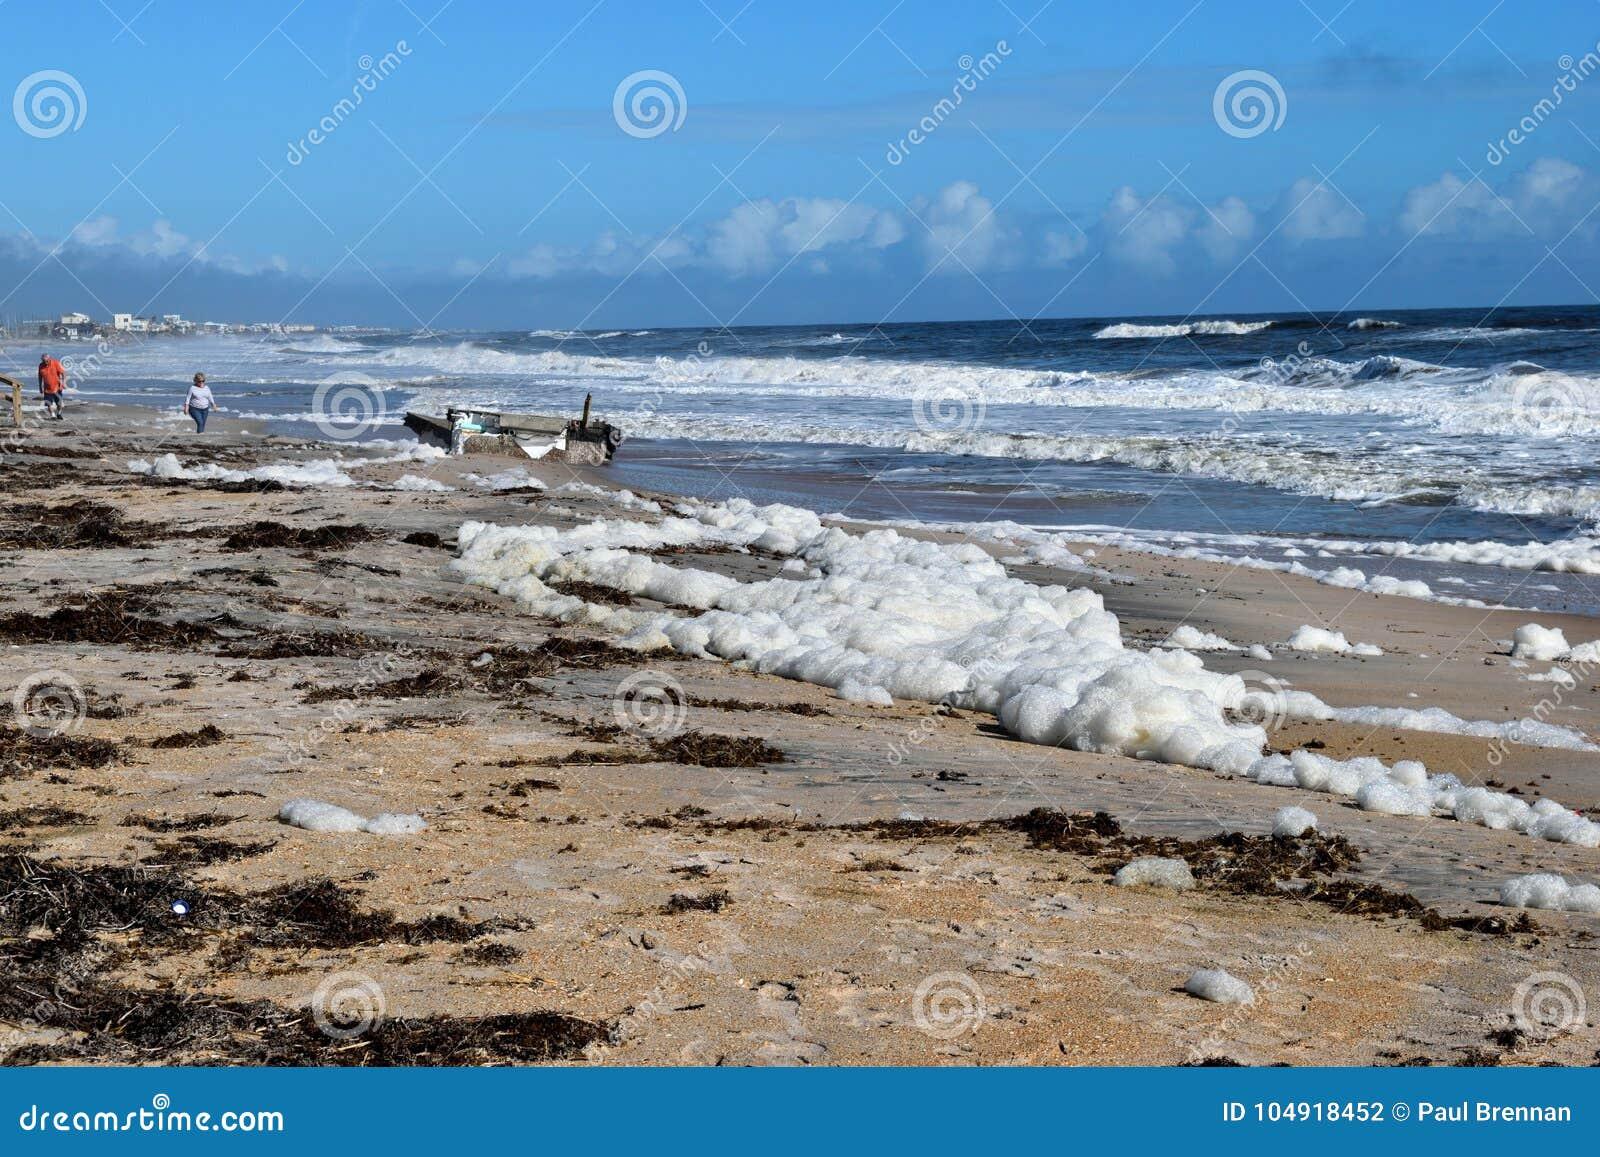 North Beach after Hurricane Irma